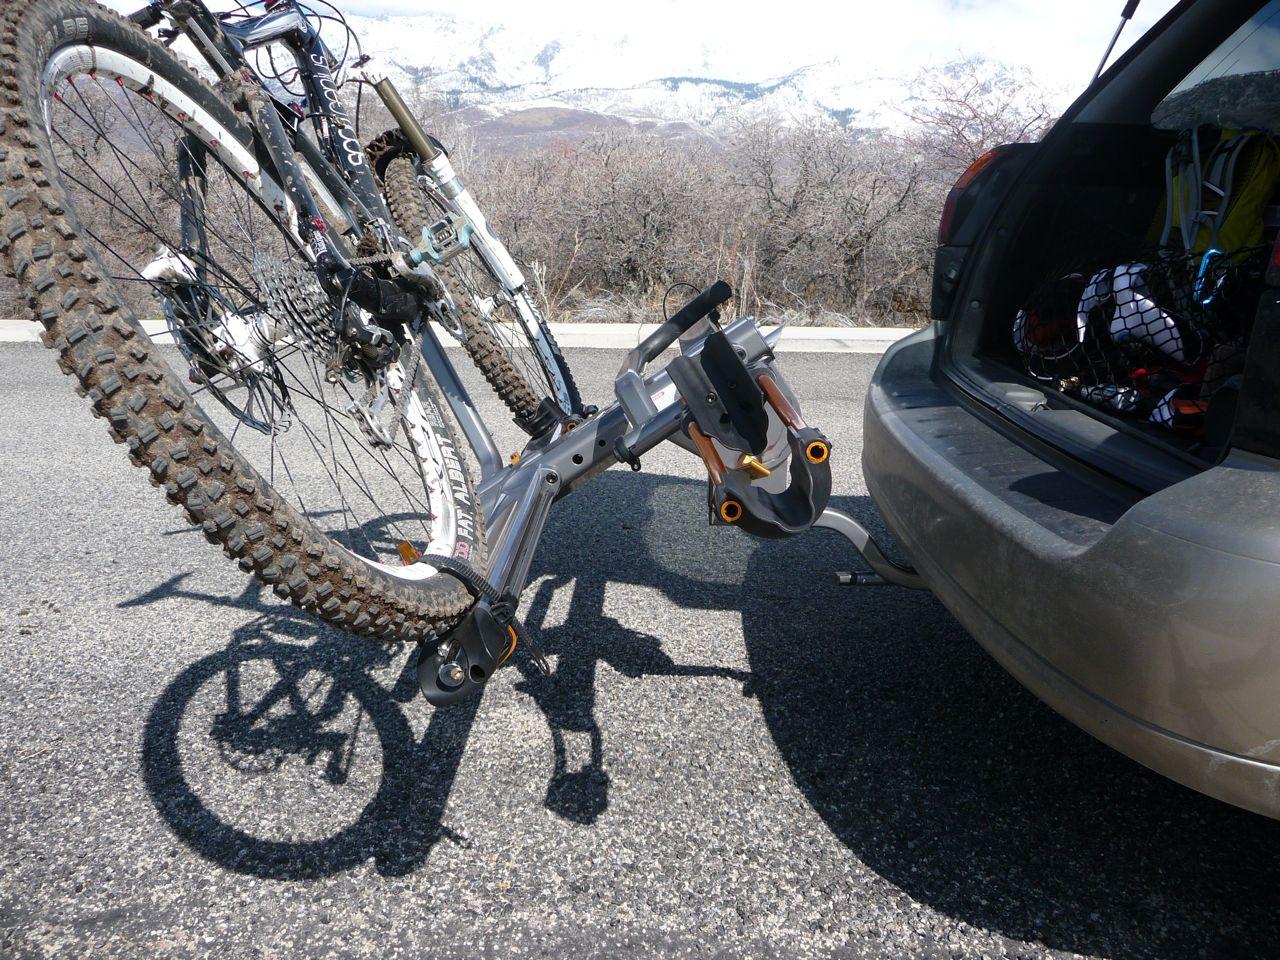 review beta bikes kuat transfer grey tray alpha adorable inch gunmetal sherpa size rack hitch single of kit bike lock full receiver